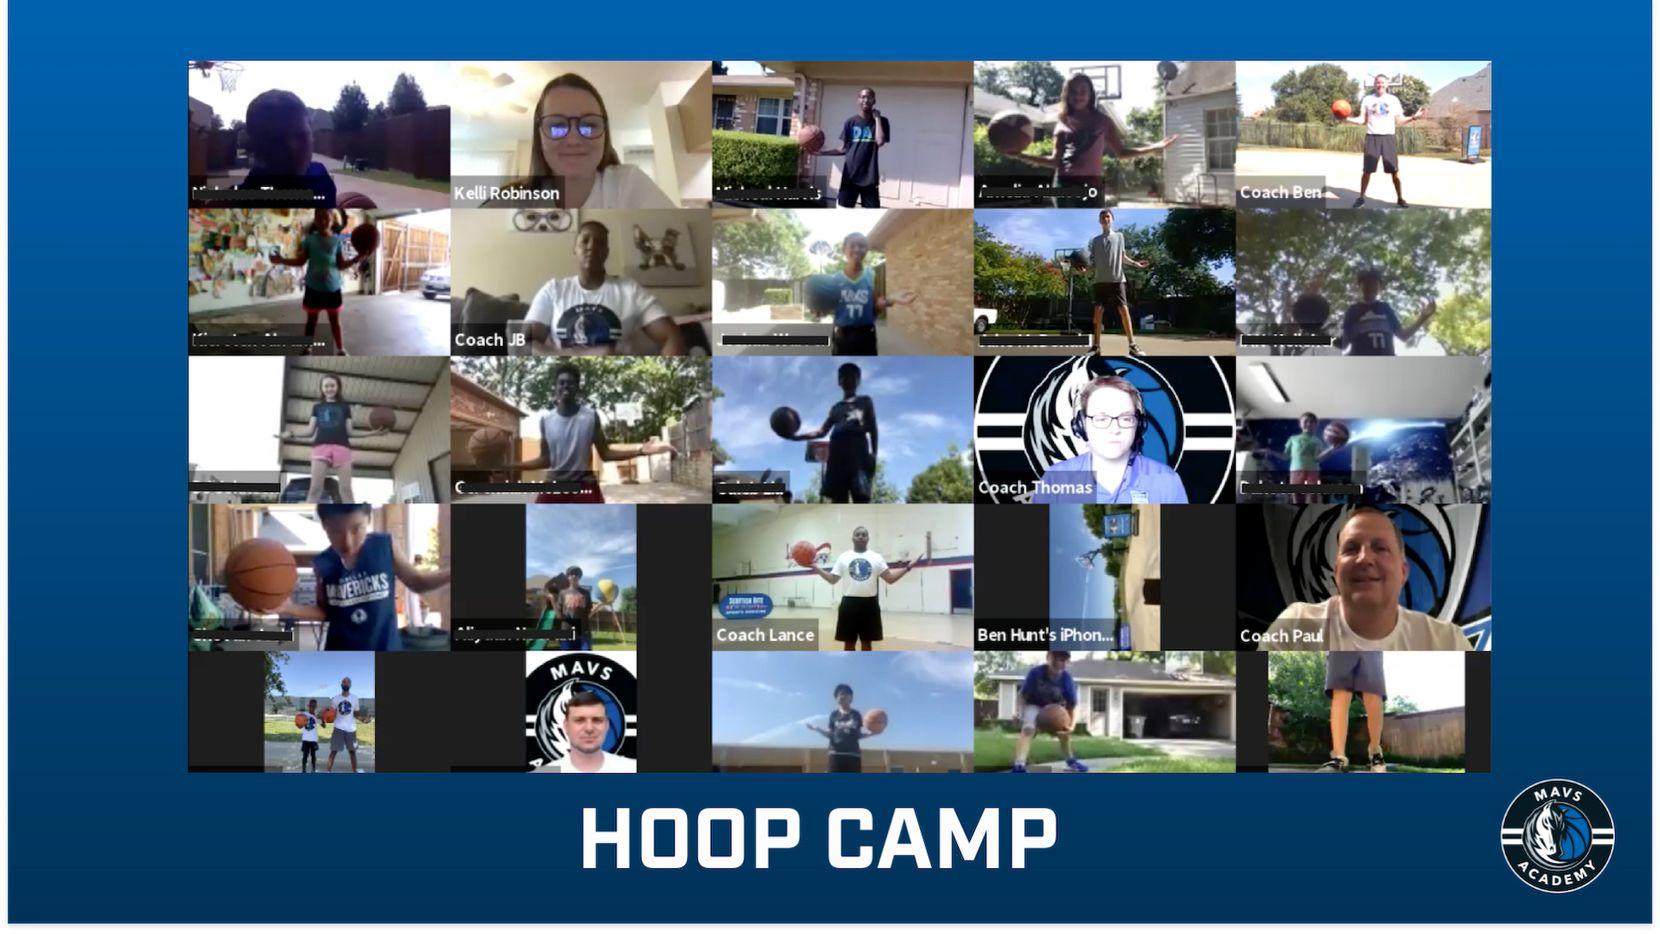 The Dallas Mavericks hosted Hoop Camp virtually to teach kids fundamentals.